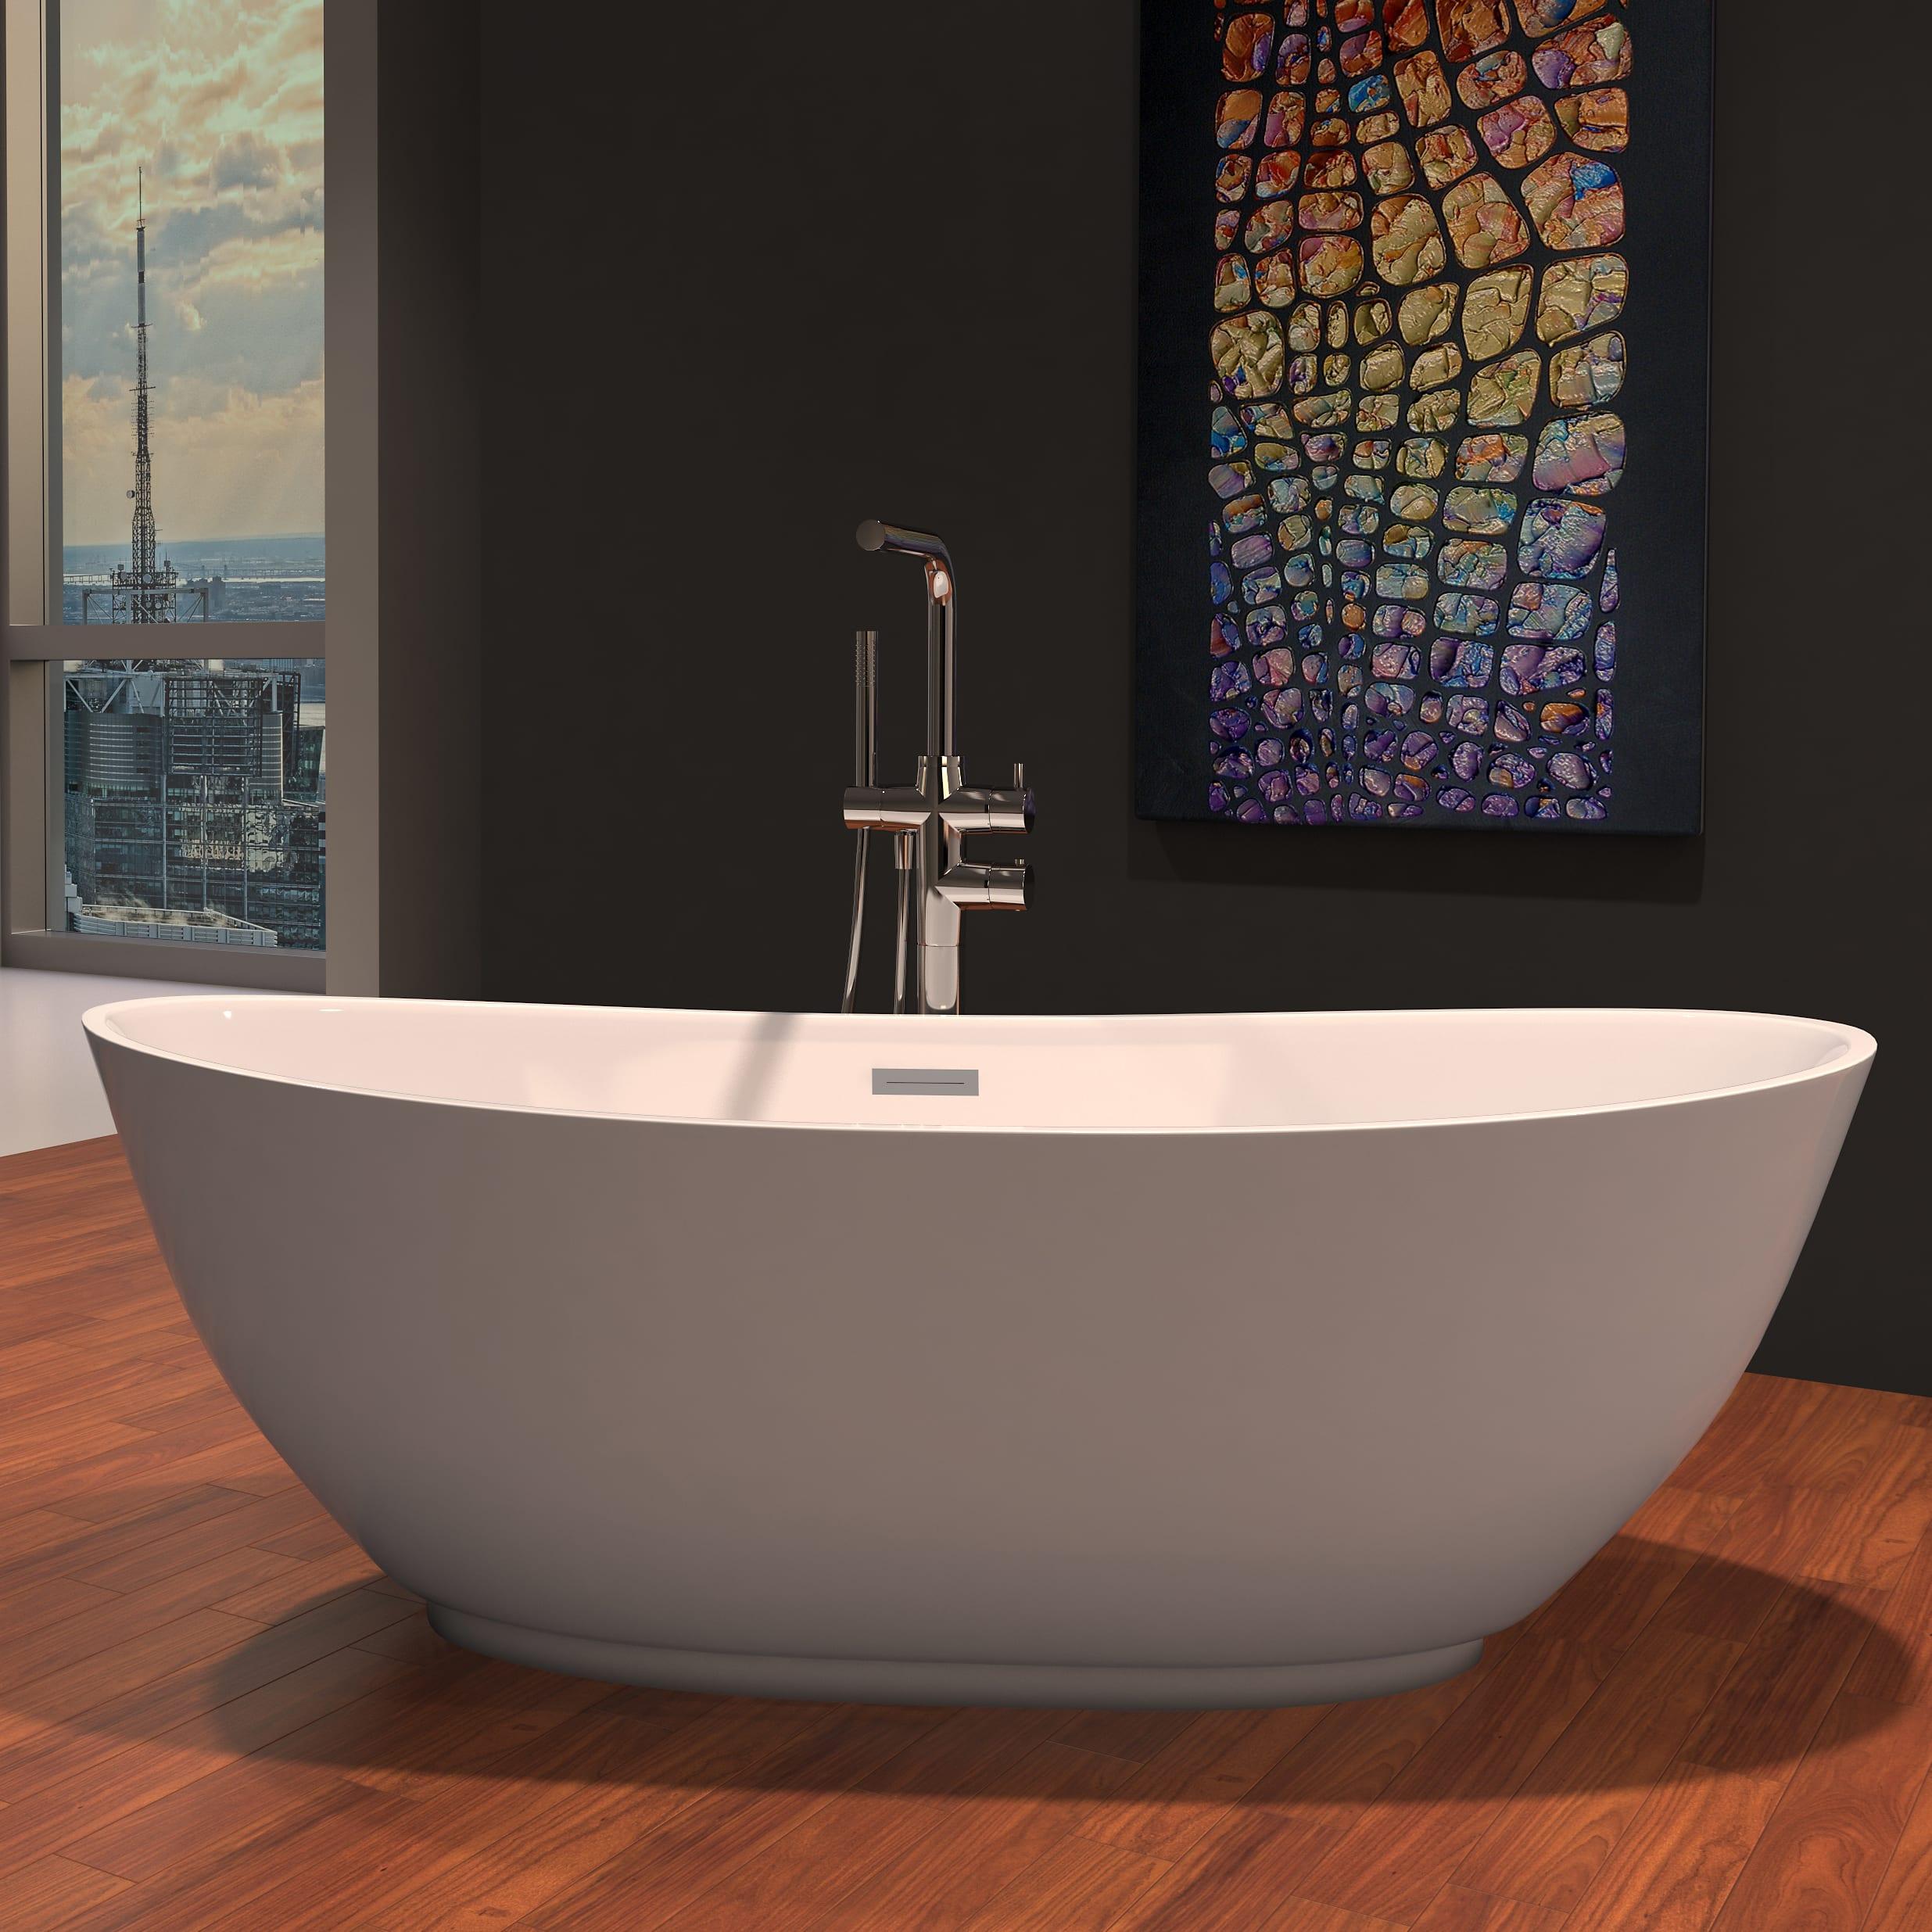 7 diy practical and decorative bathroom ideas.htm perlato ptrma6228 gw roma freestanding soaker tub qualitybath com  gw roma freestanding soaker tub